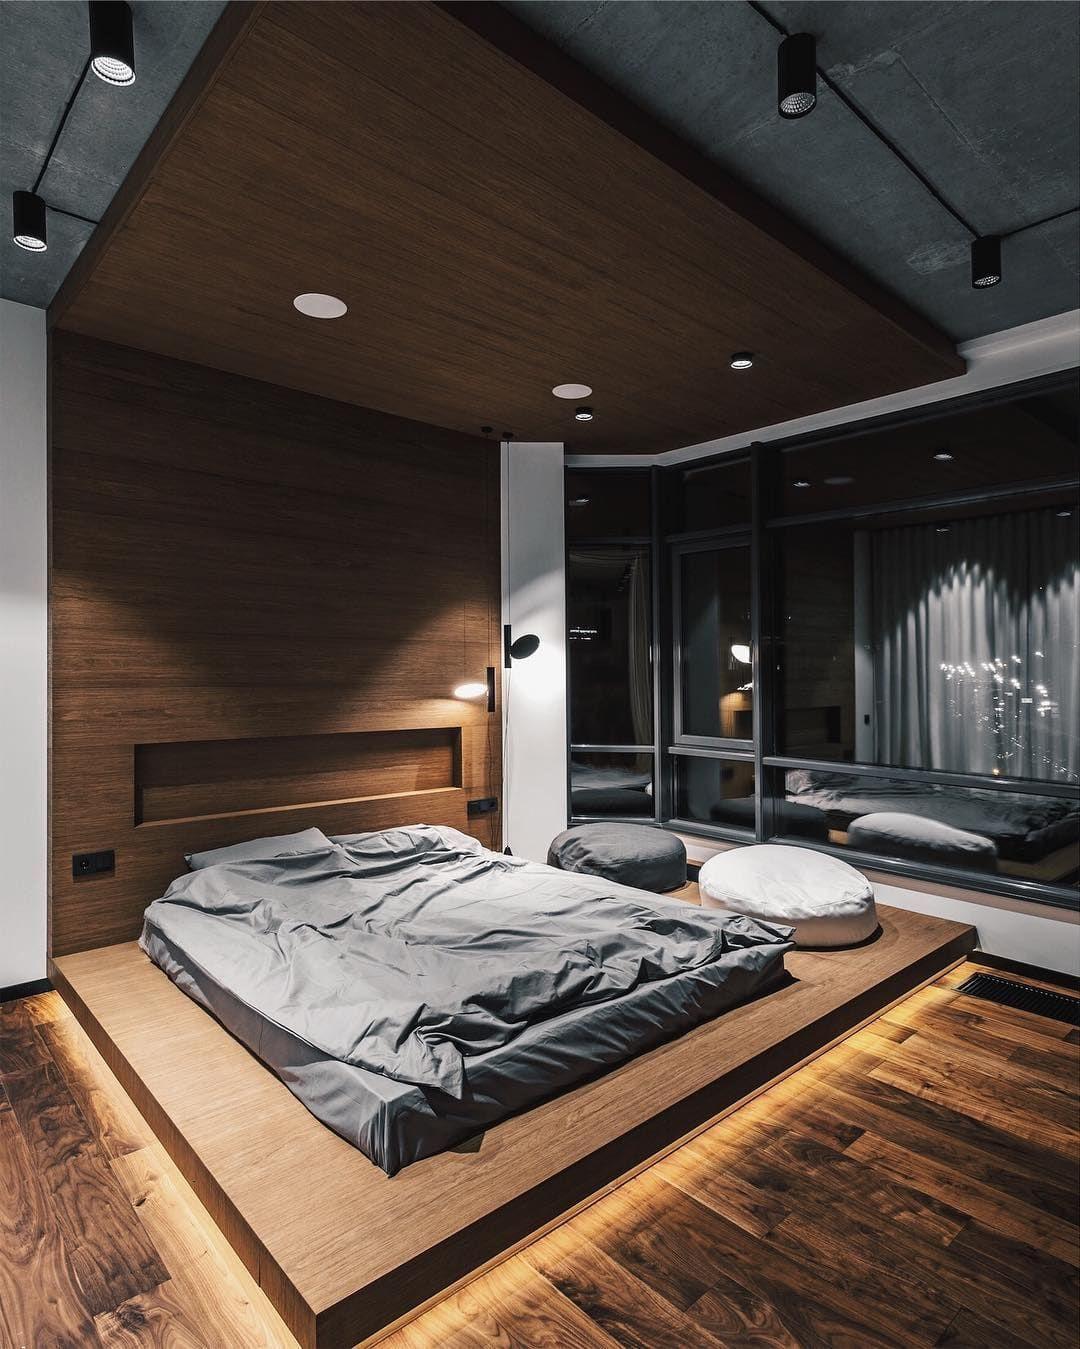 Minimal Interior Design Inspiration 214 Modern Master Bedroom Design Industrial Bedroom Design Modern Bedroom Design Bedroom interior design inspiration